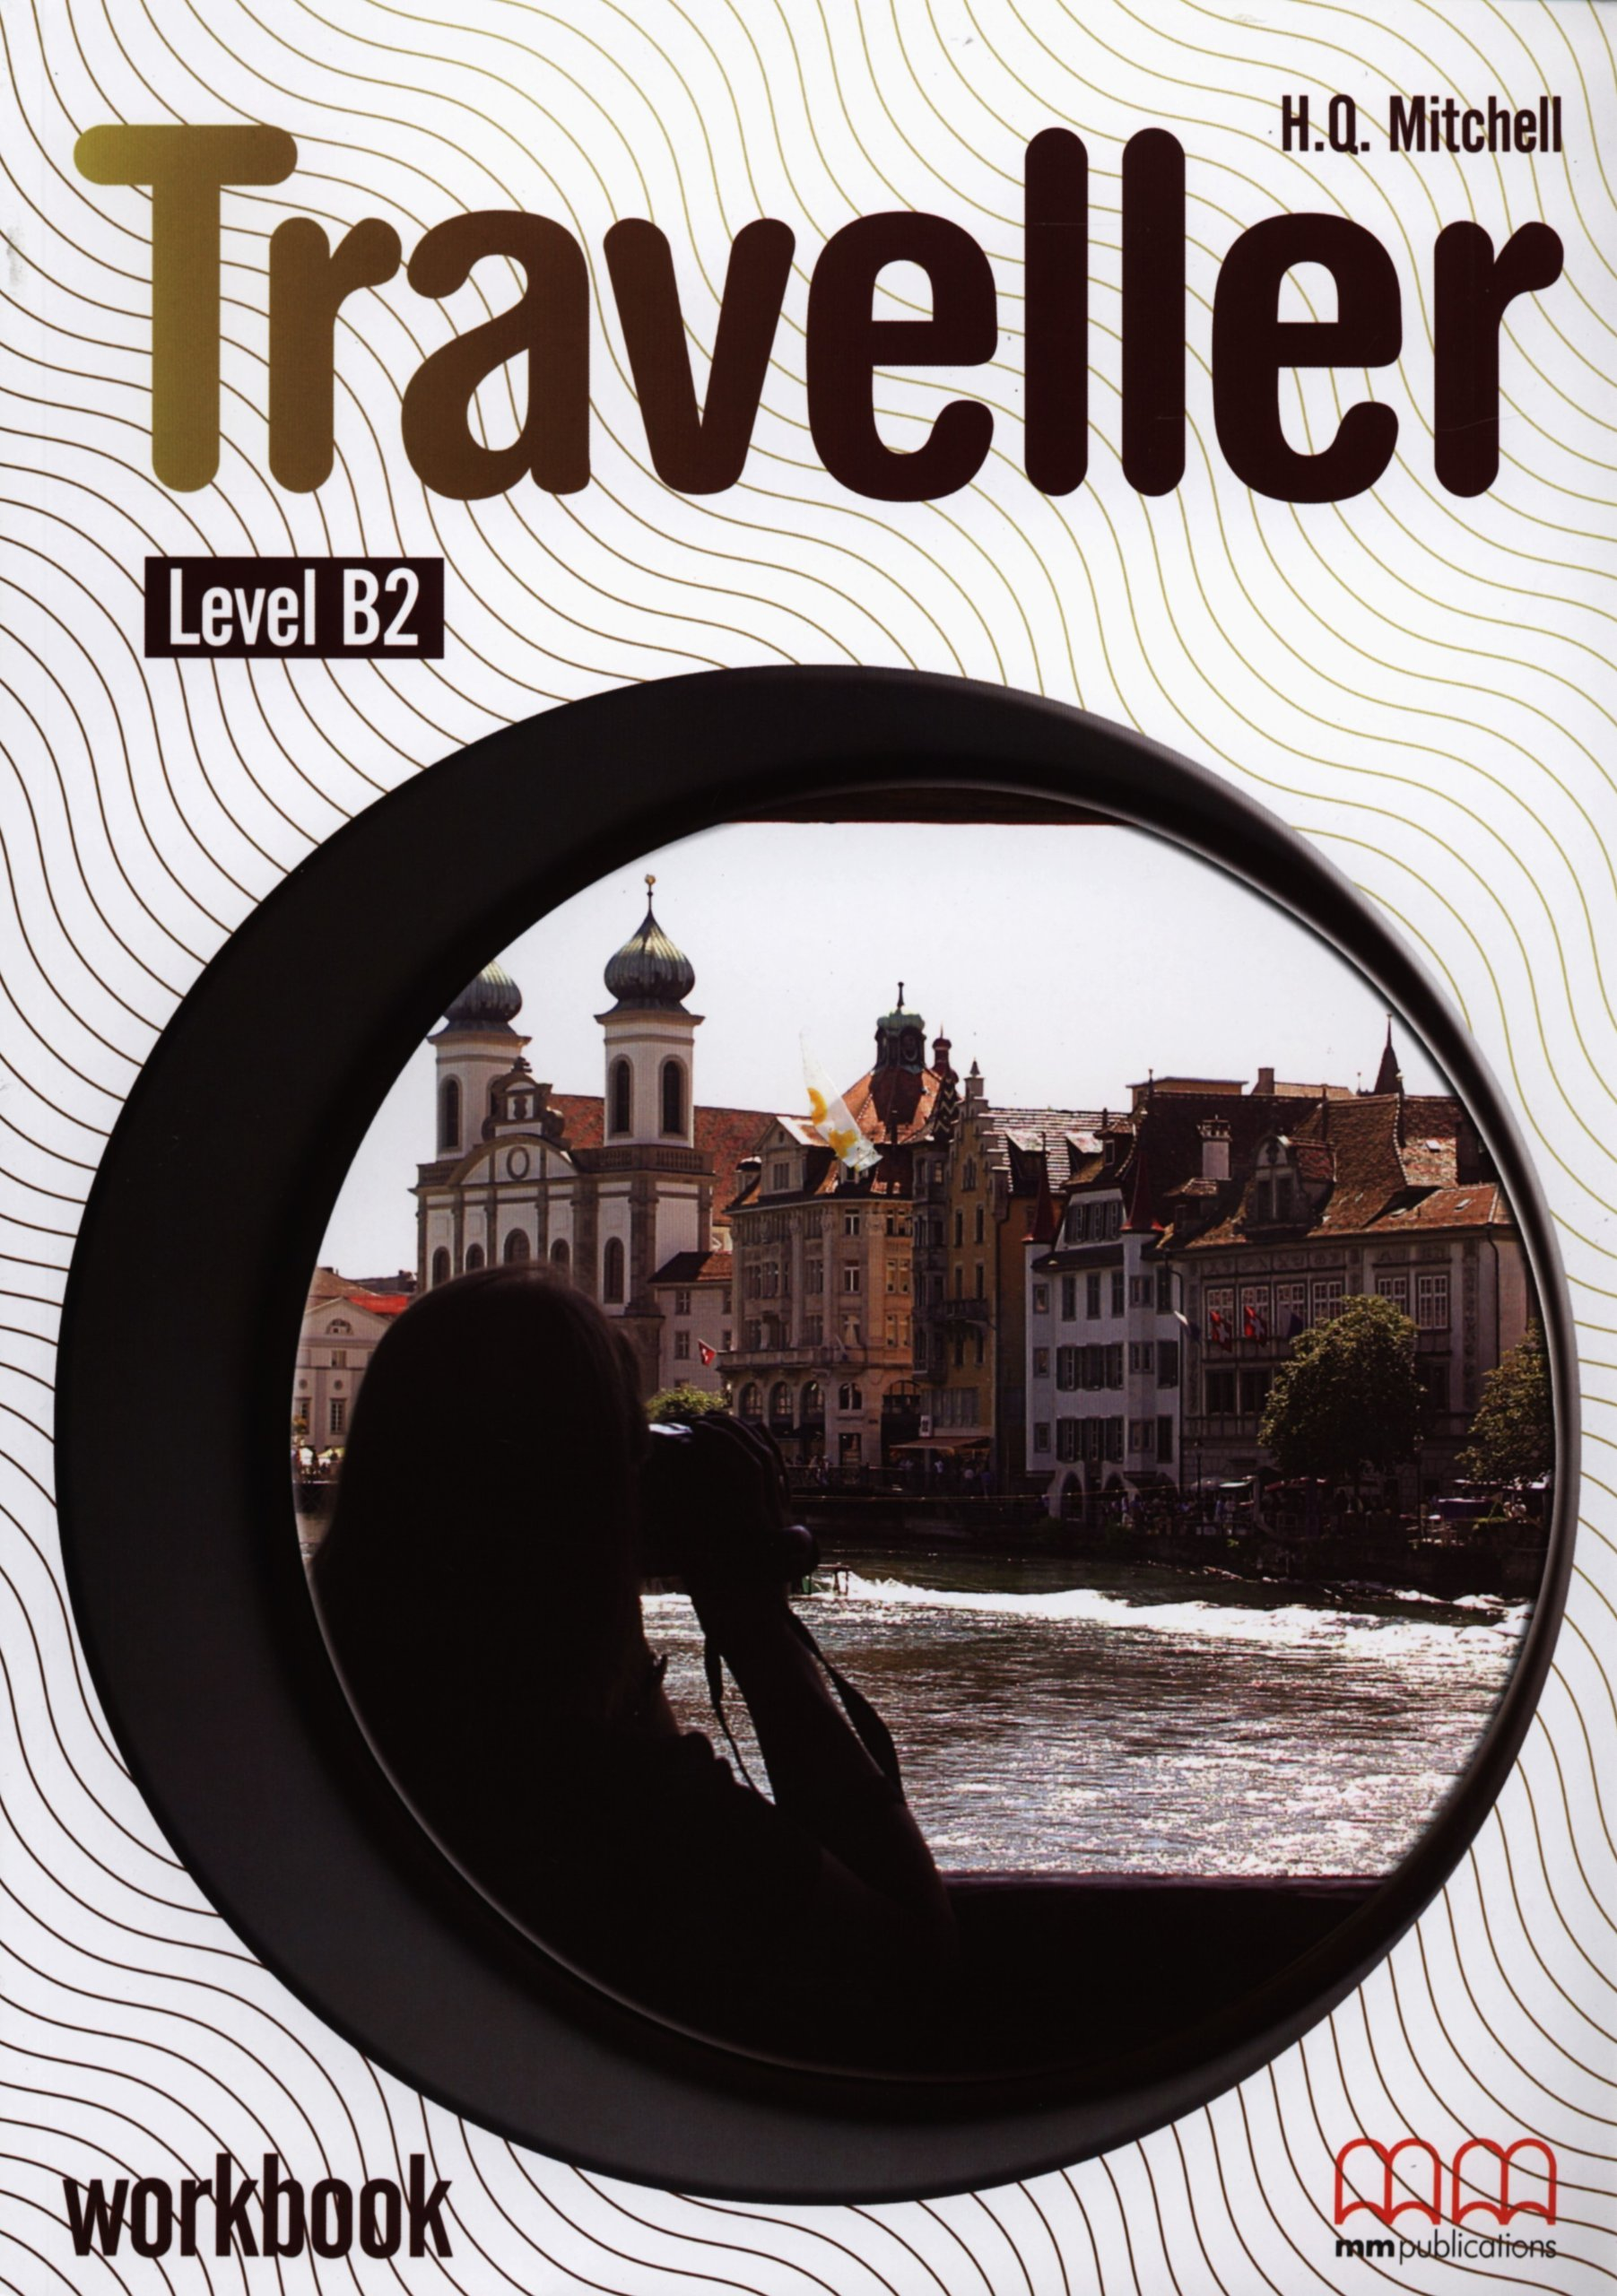 Traveller b2 level workbook amazon vvaa libros en idiomas traveller b2 level workbook amazon vvaa libros en idiomas extranjeros fandeluxe Images